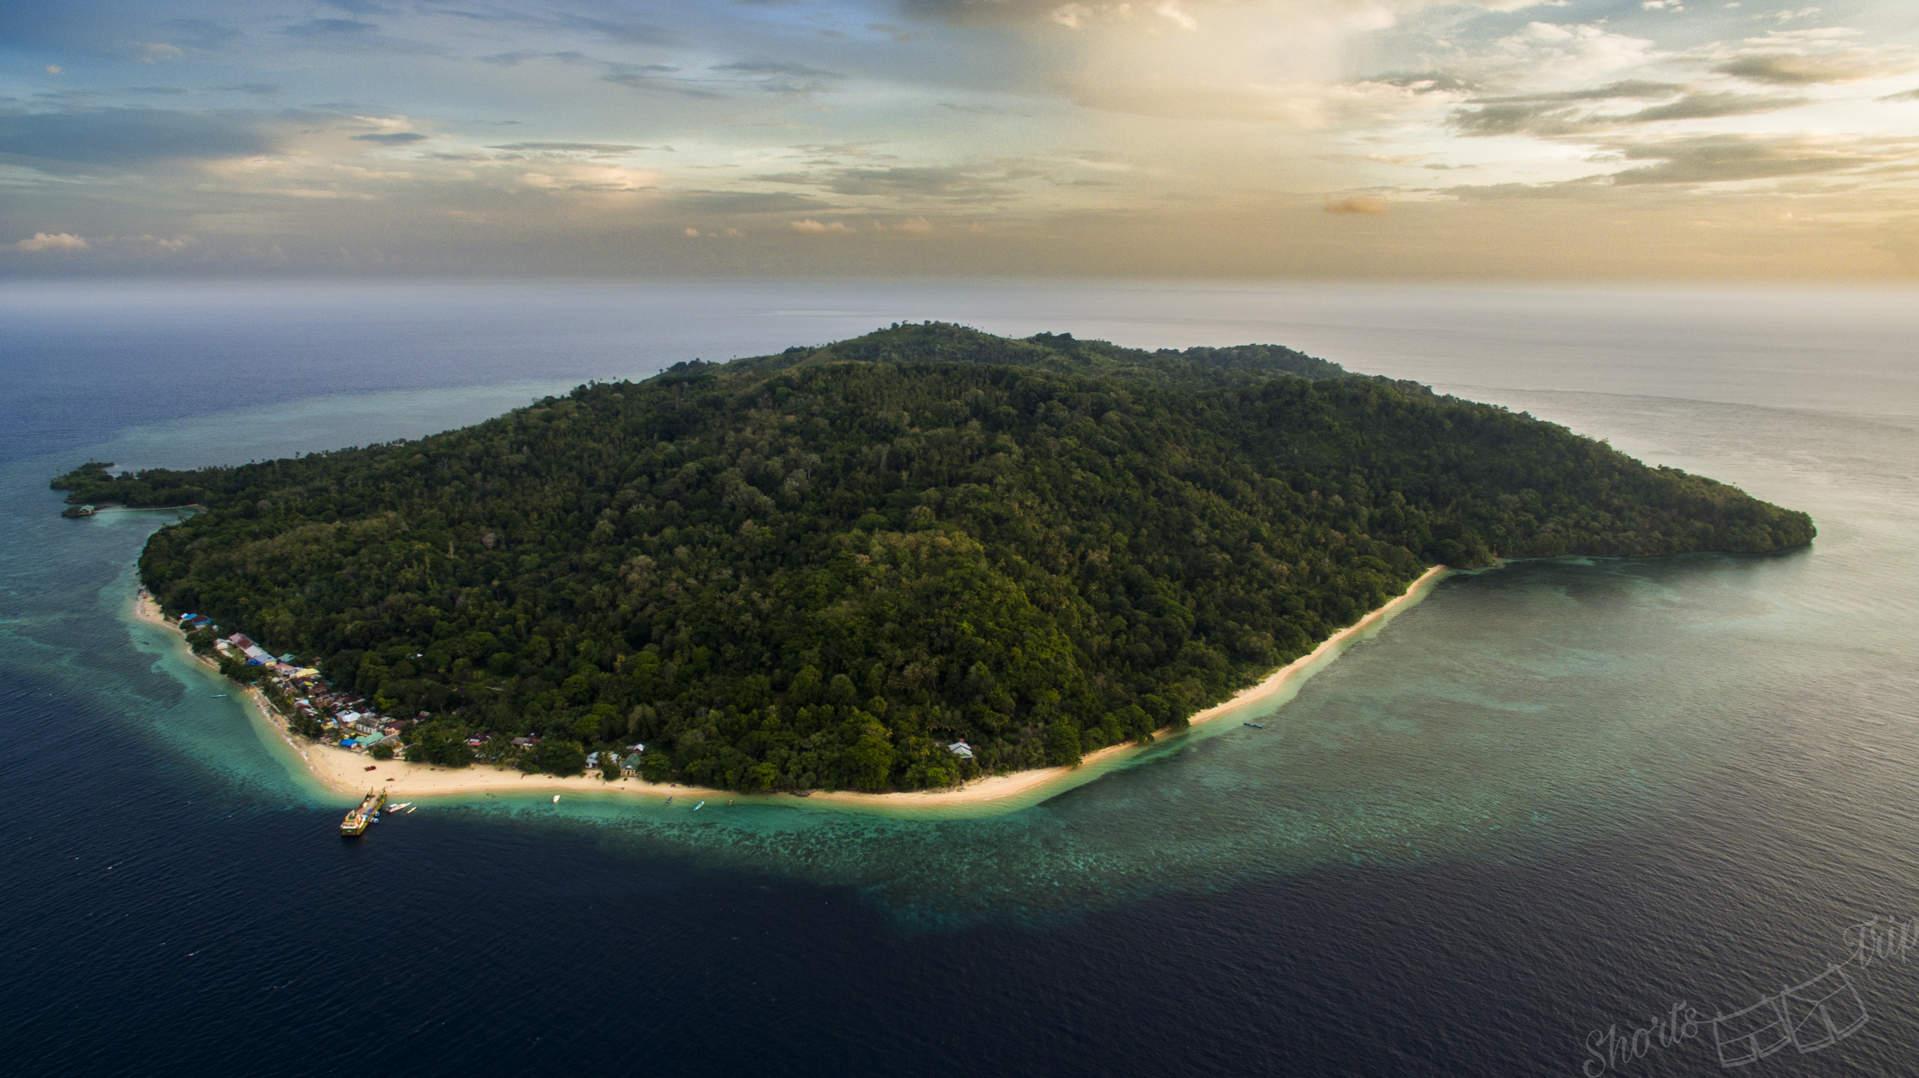 banda islands, pulau hatta, island hatta, best snorkeling hatta, how to get to hatta, hatta boat hatta travel, hatta aerial, hatta drone, banda islands drone, banda islands aerial